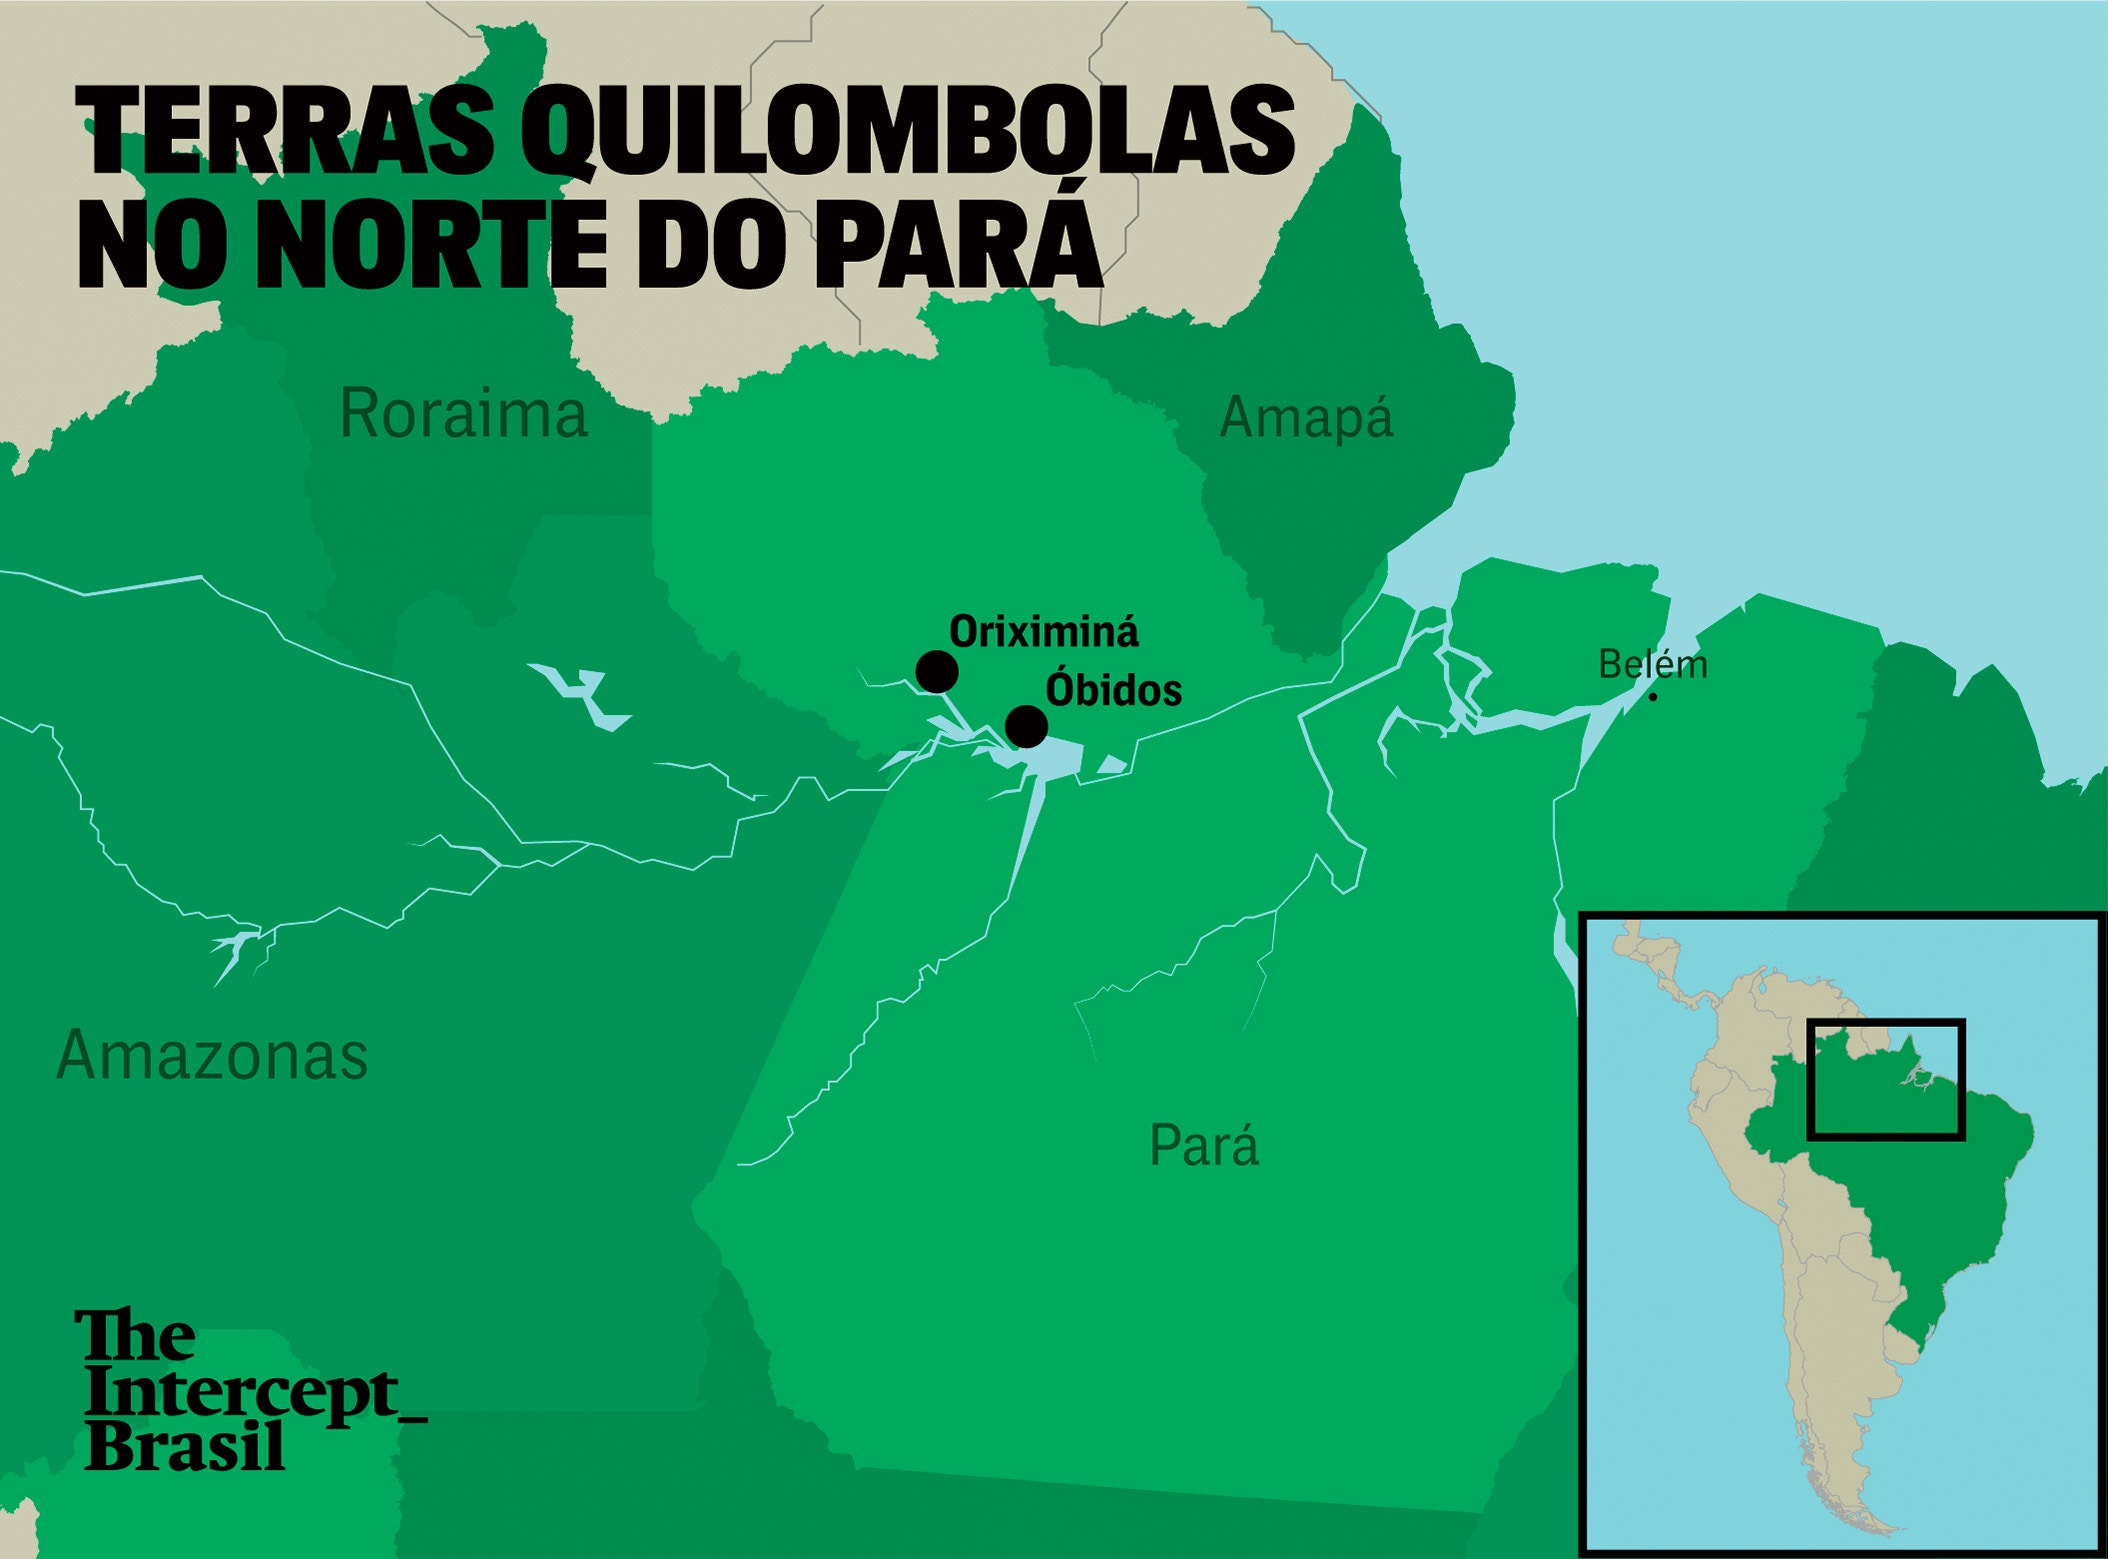 Mapa: Rodrigo Bento/The Intercept Brasil